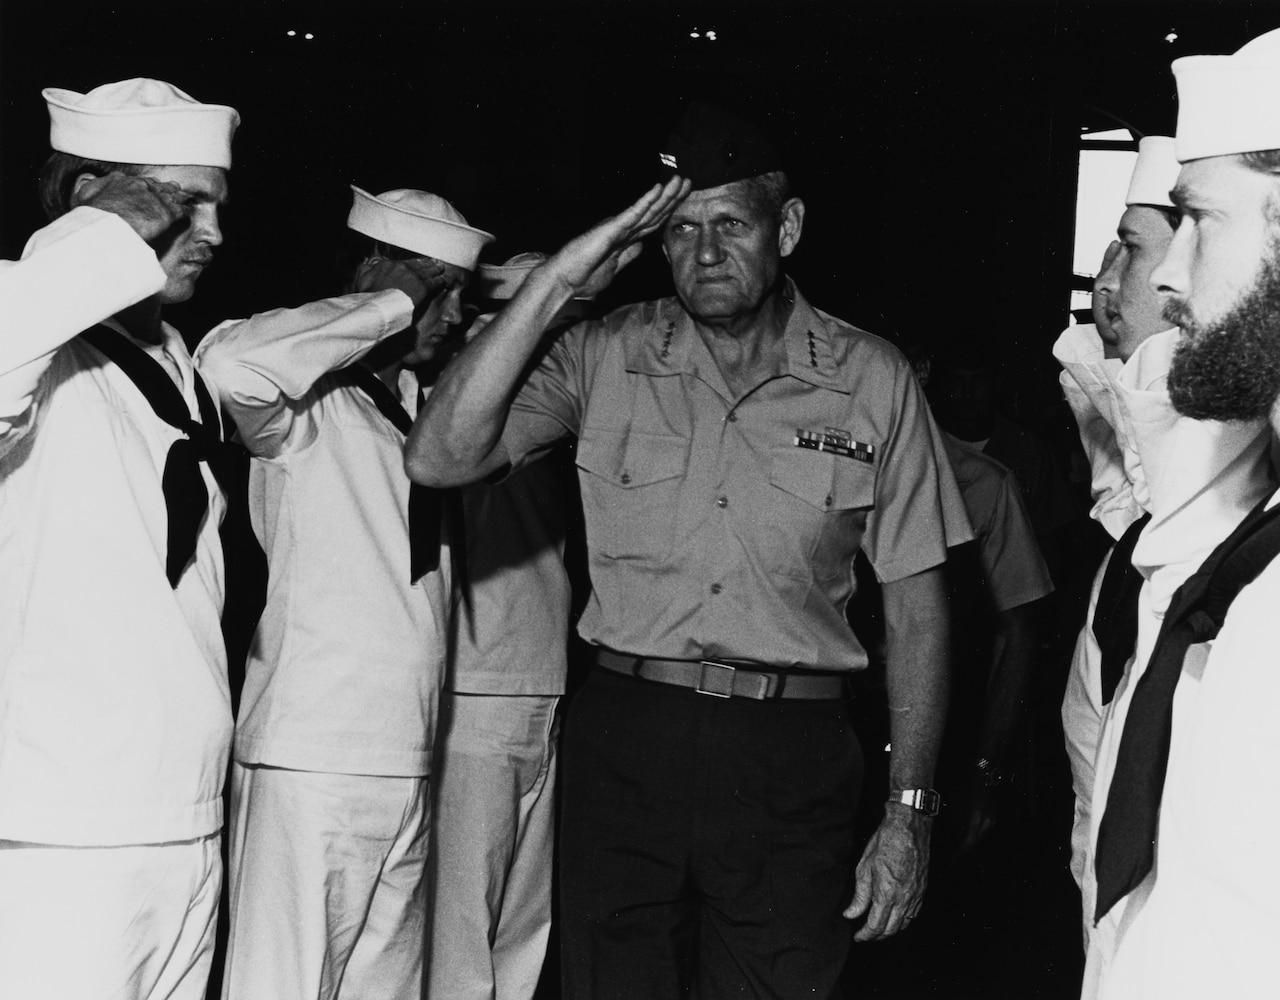 A man in a Marine uniform salutes sailors in dress white uniforms.